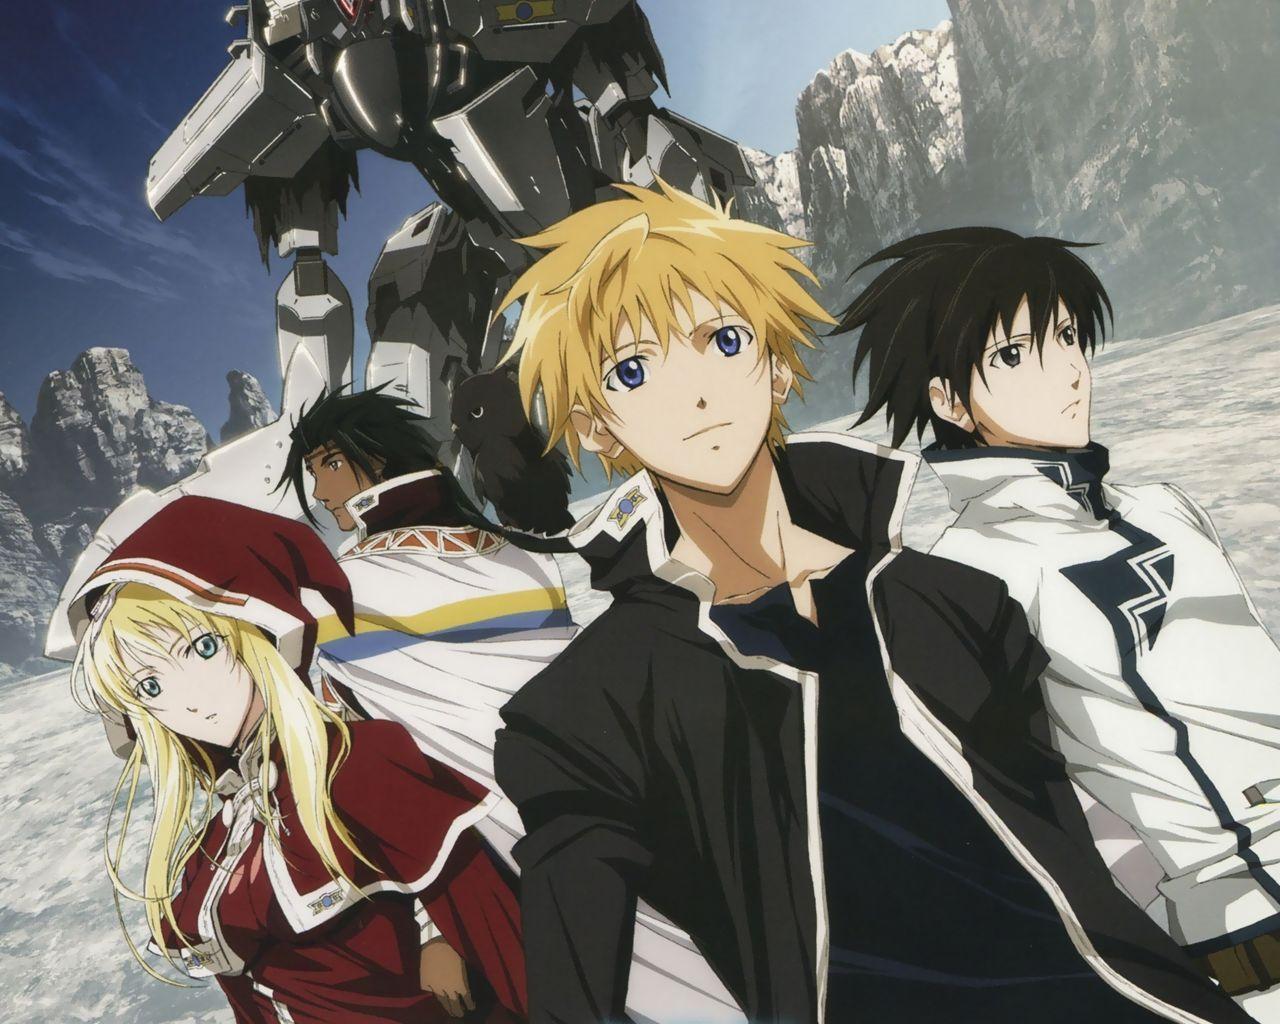 anime_wallpaper_Broken_Blade_17178993.jpg